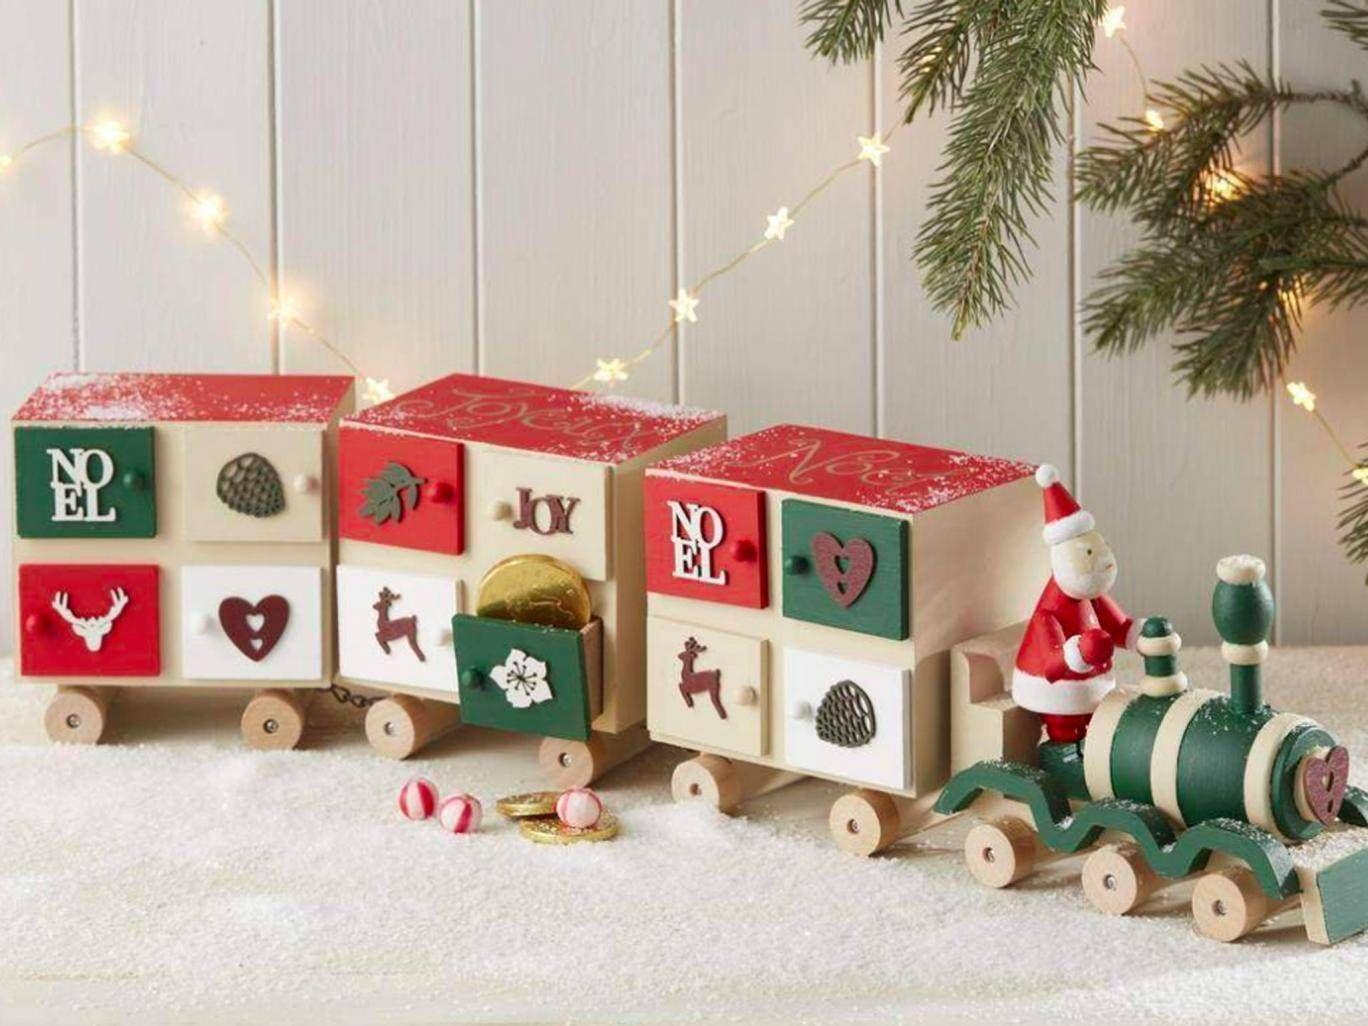 10 Best Diy Advent Calendars Wineadventcalendardiy 10 Best Diy Advent Calendars The In 2020 Diy Advent Calendar Wine Bottle Diy Crafts Christmas Advent Calendar Diy